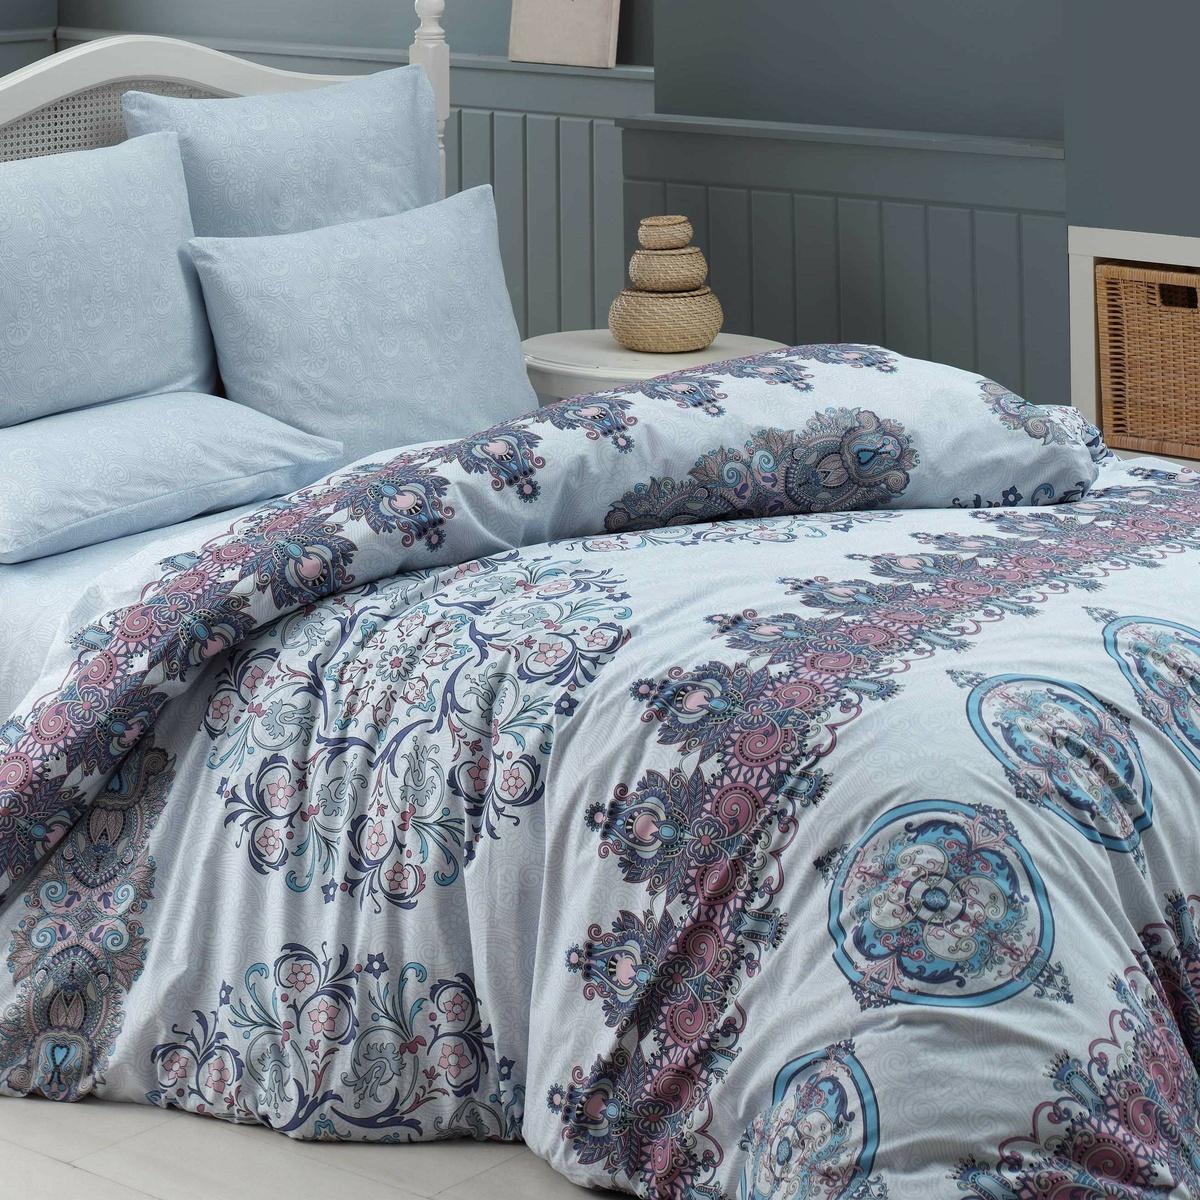 mikroplysove povleceni 200 220 2x 70 90. Black Bedroom Furniture Sets. Home Design Ideas